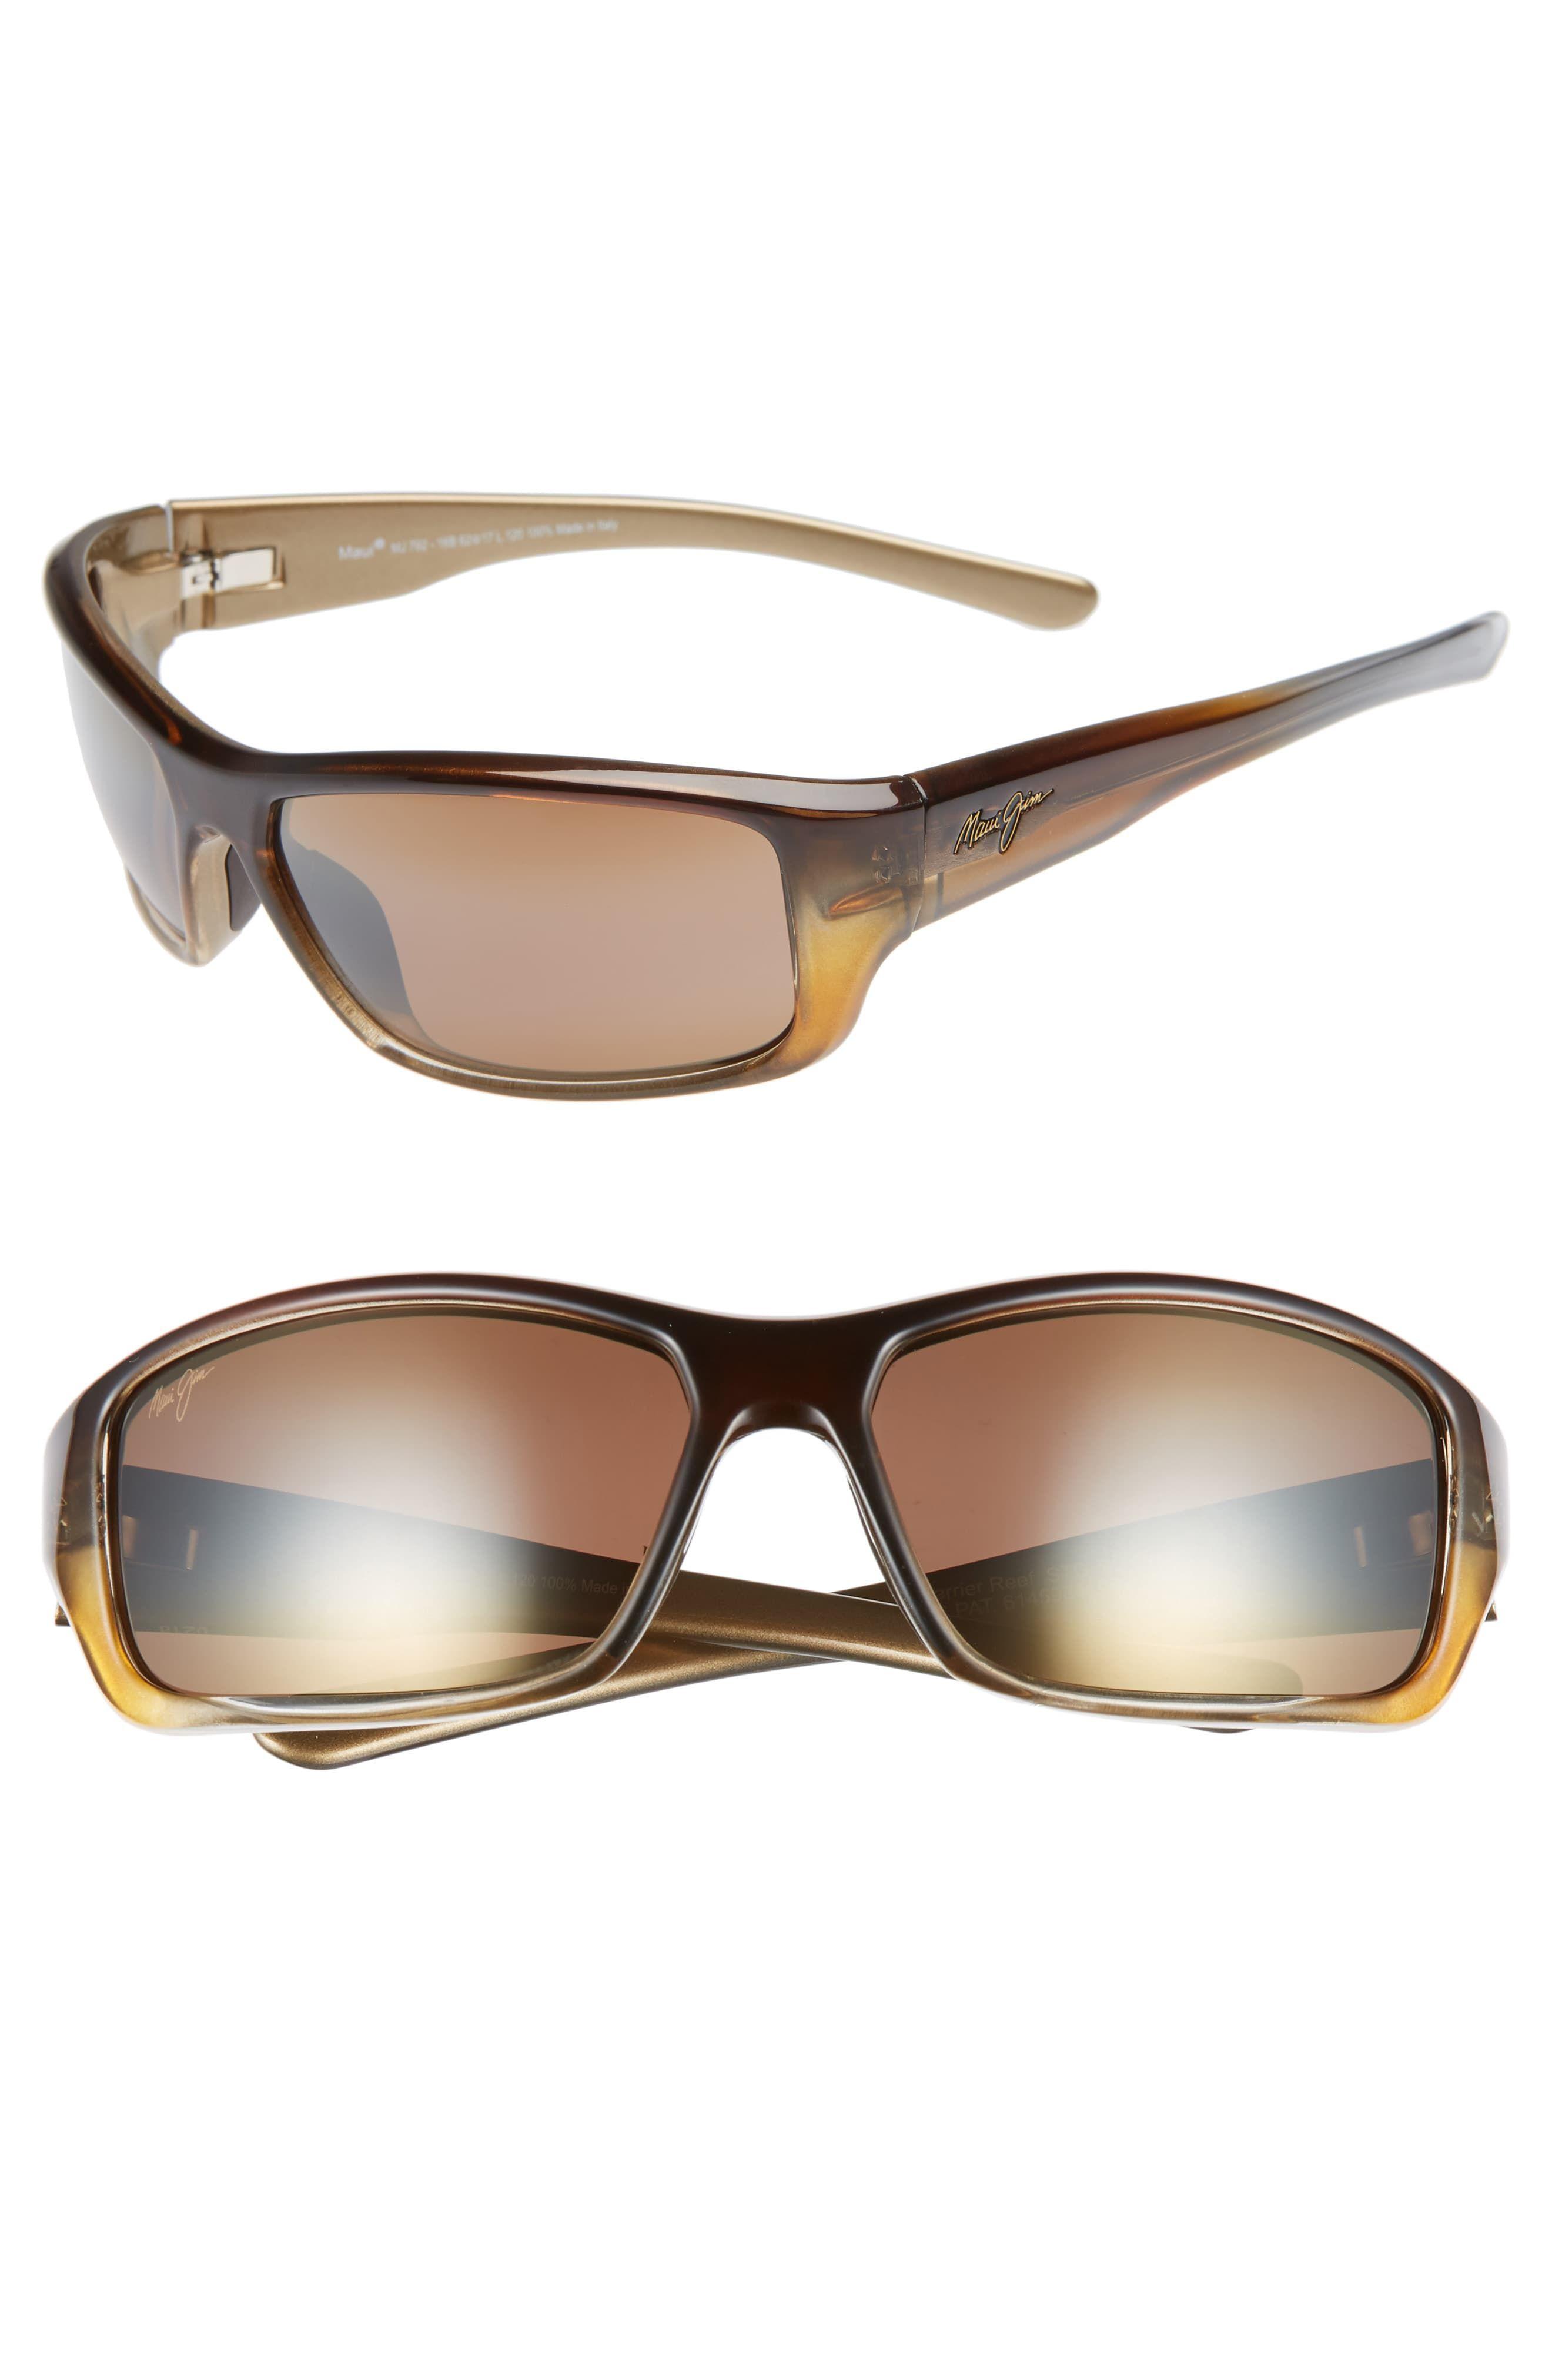 479d026cb82 Men's Maui Jim Barrier Reef 62Mm Polarizedplus2 Sunglasses - Brown Gold/  Bronze